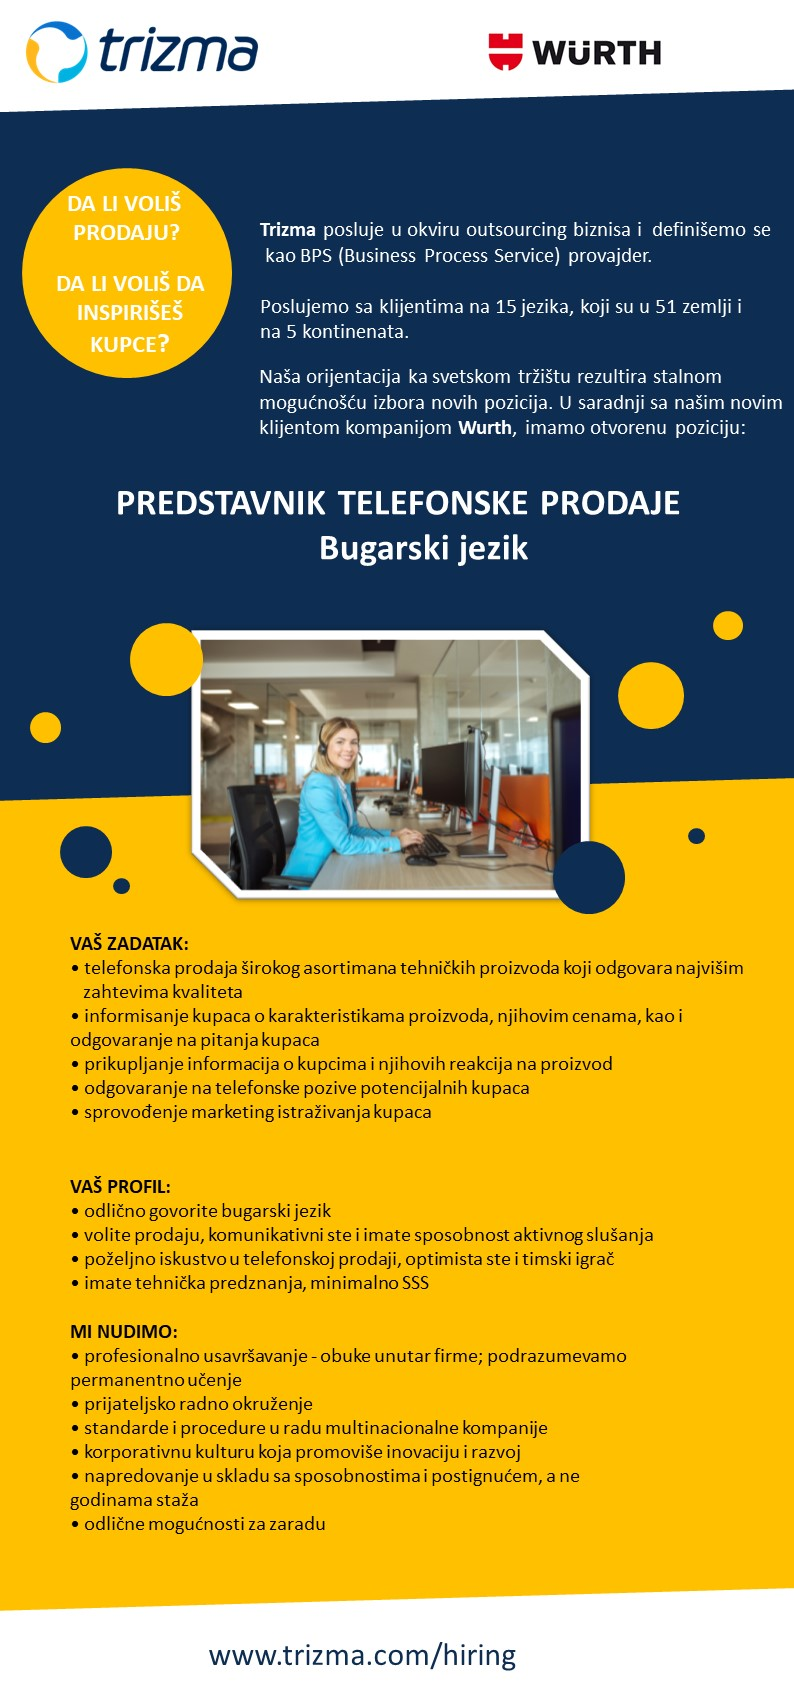 Predstavnik telefonske prodaje za Bugarski jezik